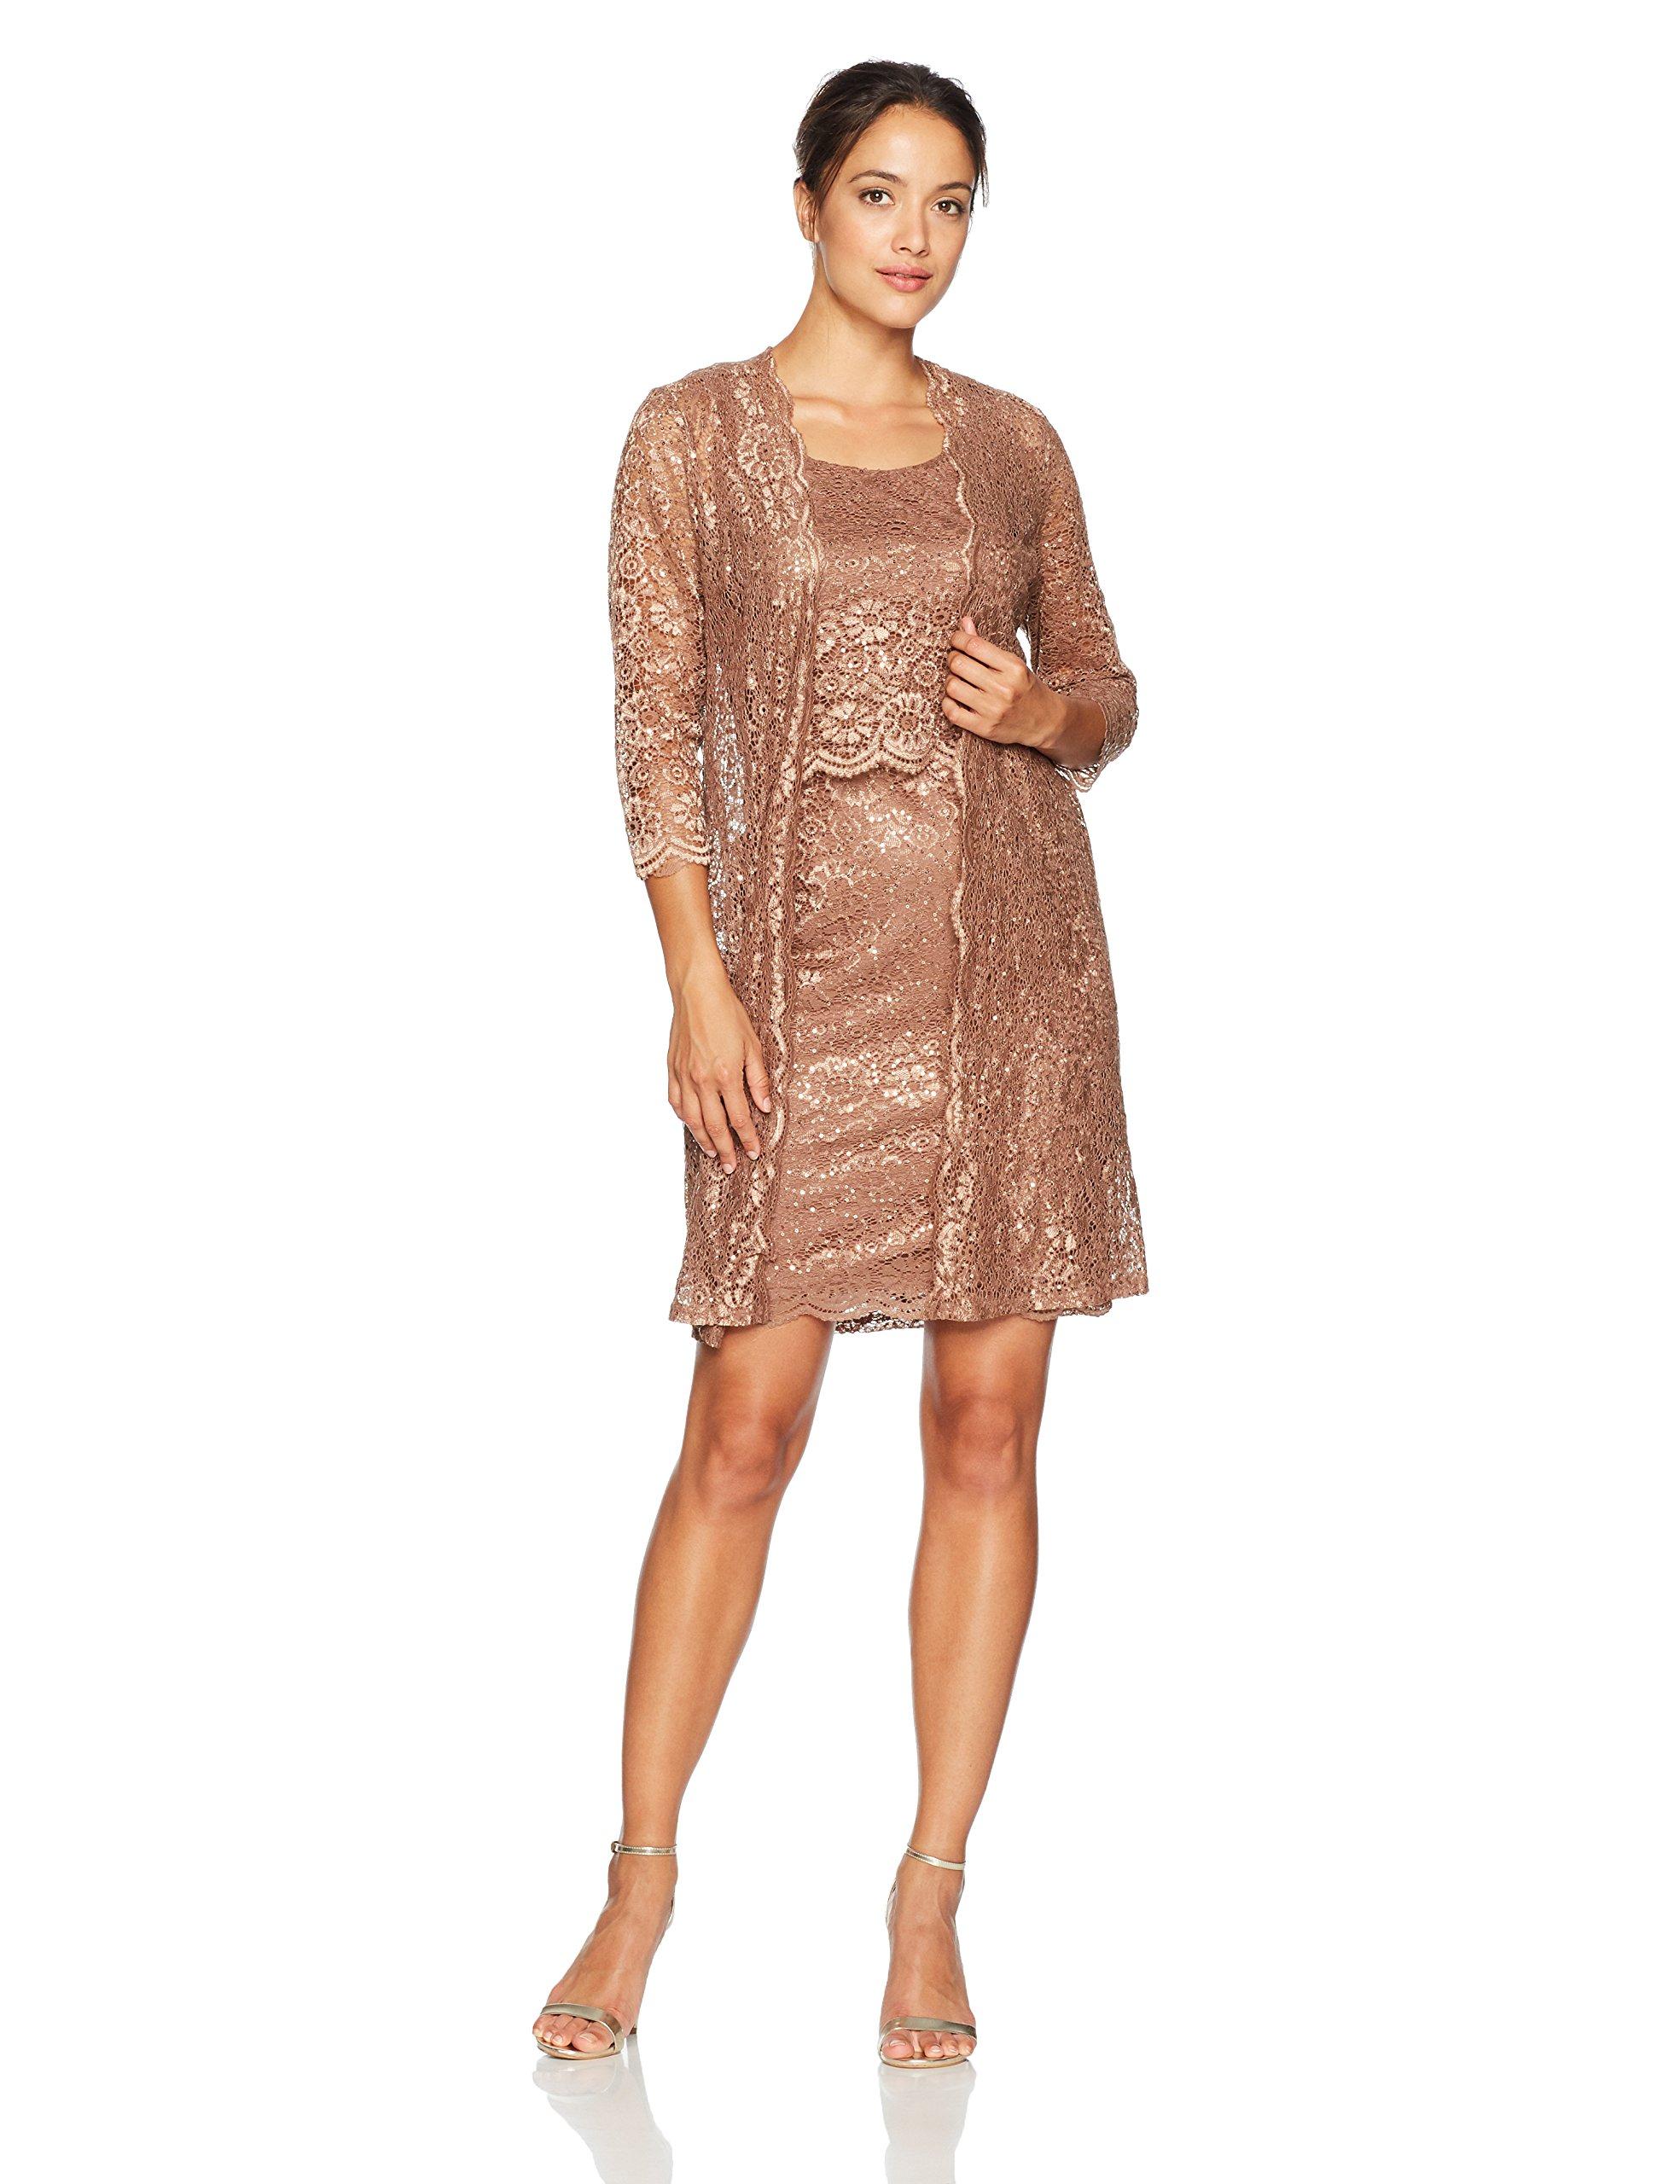 R&M Richards Women's Petite 2 PCE Laced Scallop Coat Dress, Cocoa, 12P